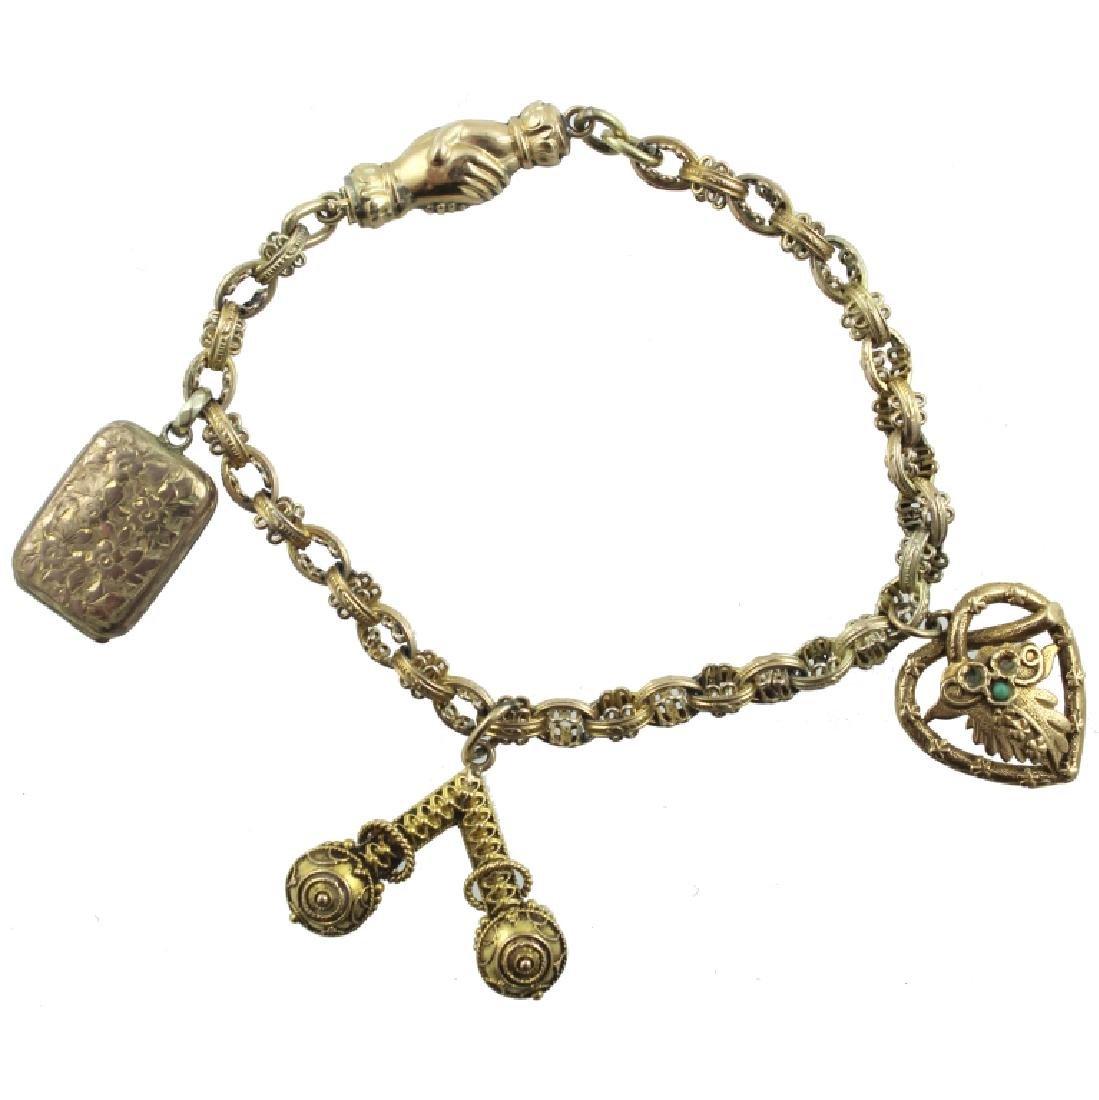 10K-14K Antique Charm Bracelet